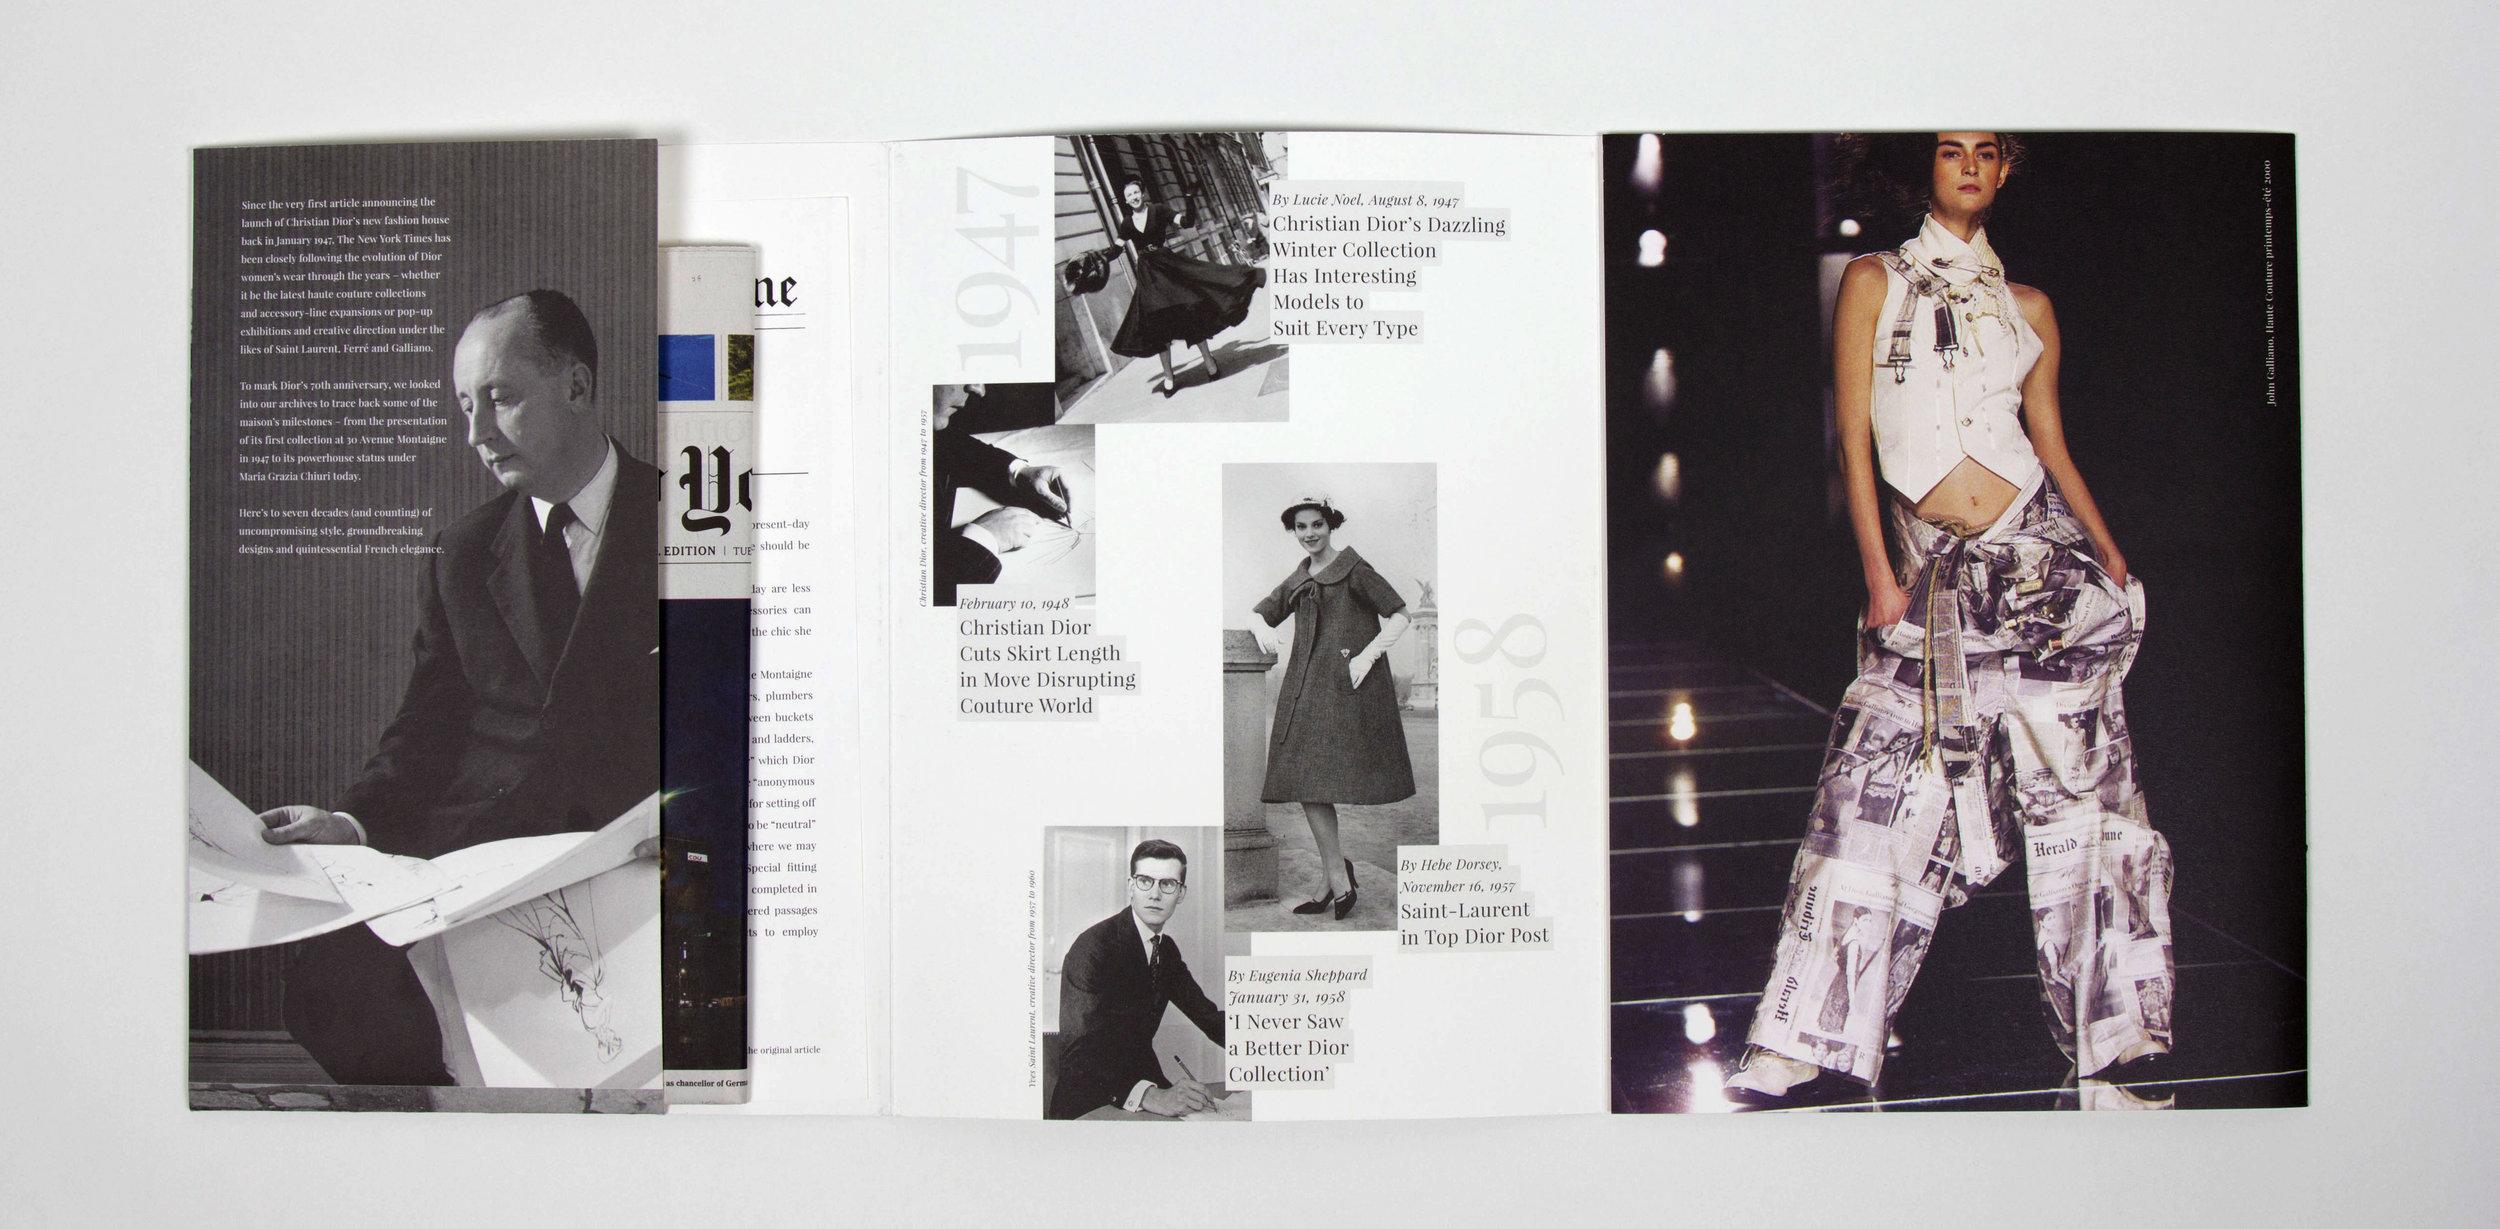 CBS_Website_Dior_Image04.jpg